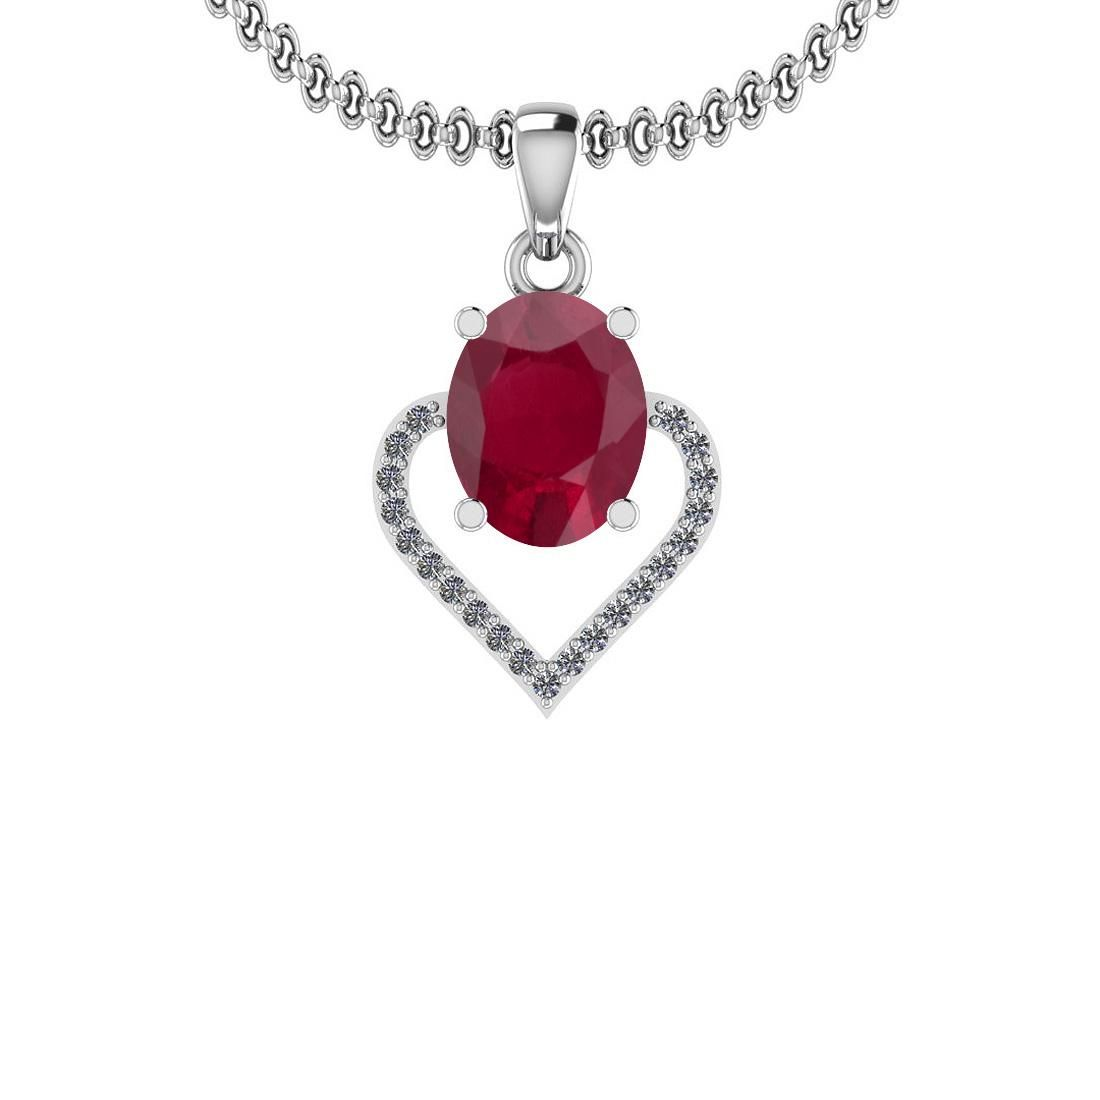 1.40 Ctw I2/I3 Ruby And Diamond 14K White Gold Necklace